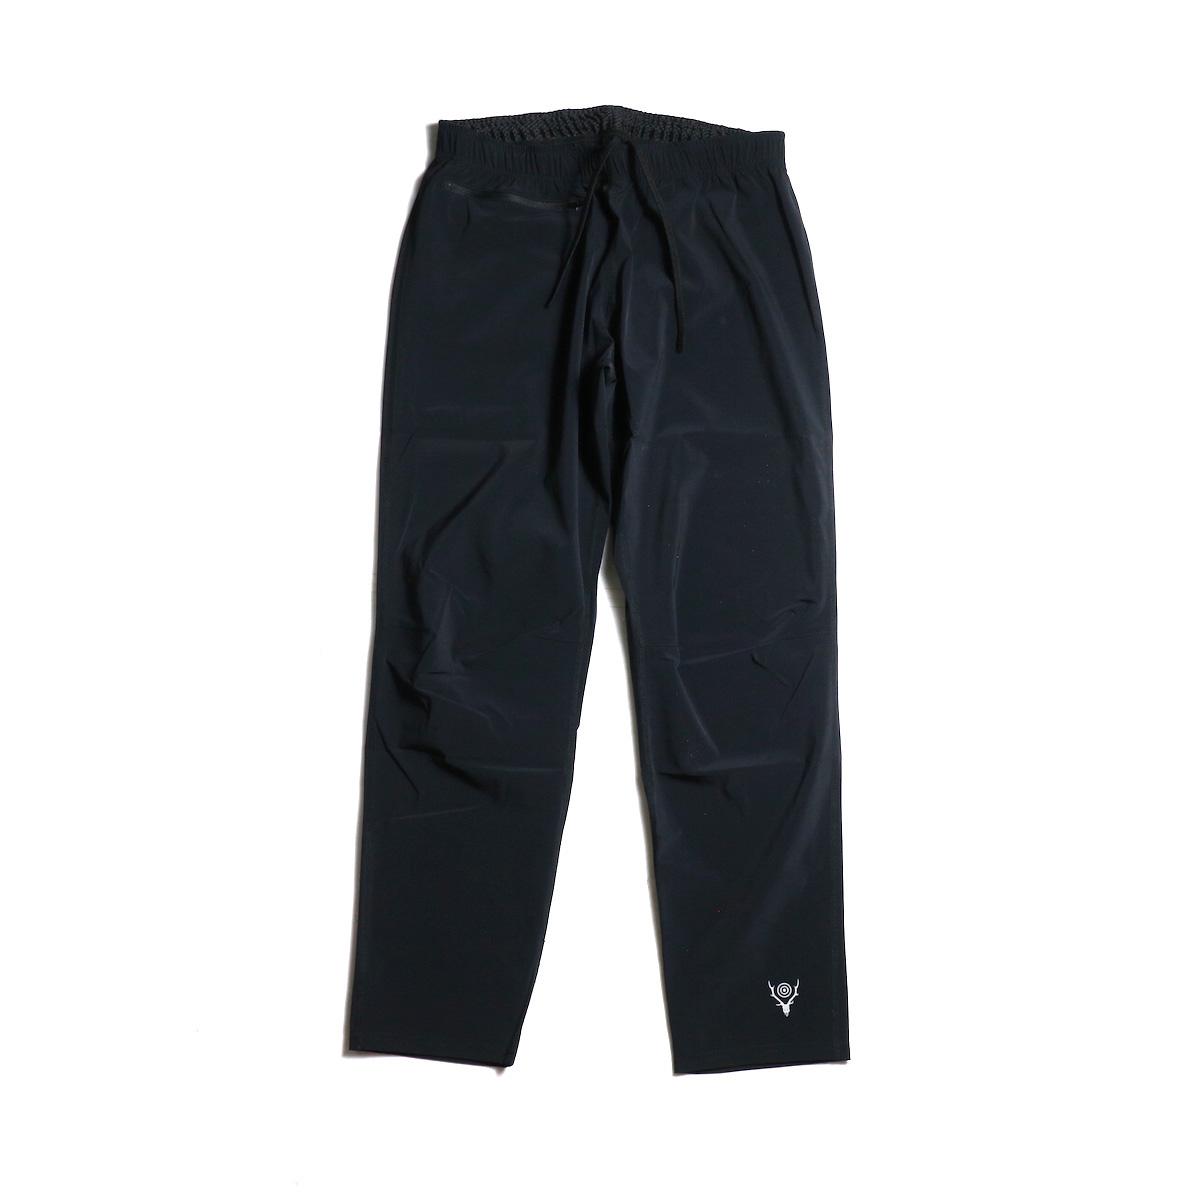 SOUTH2 WEST8 / 1P Cycle Pant-N/Pu Taffeta (Black)